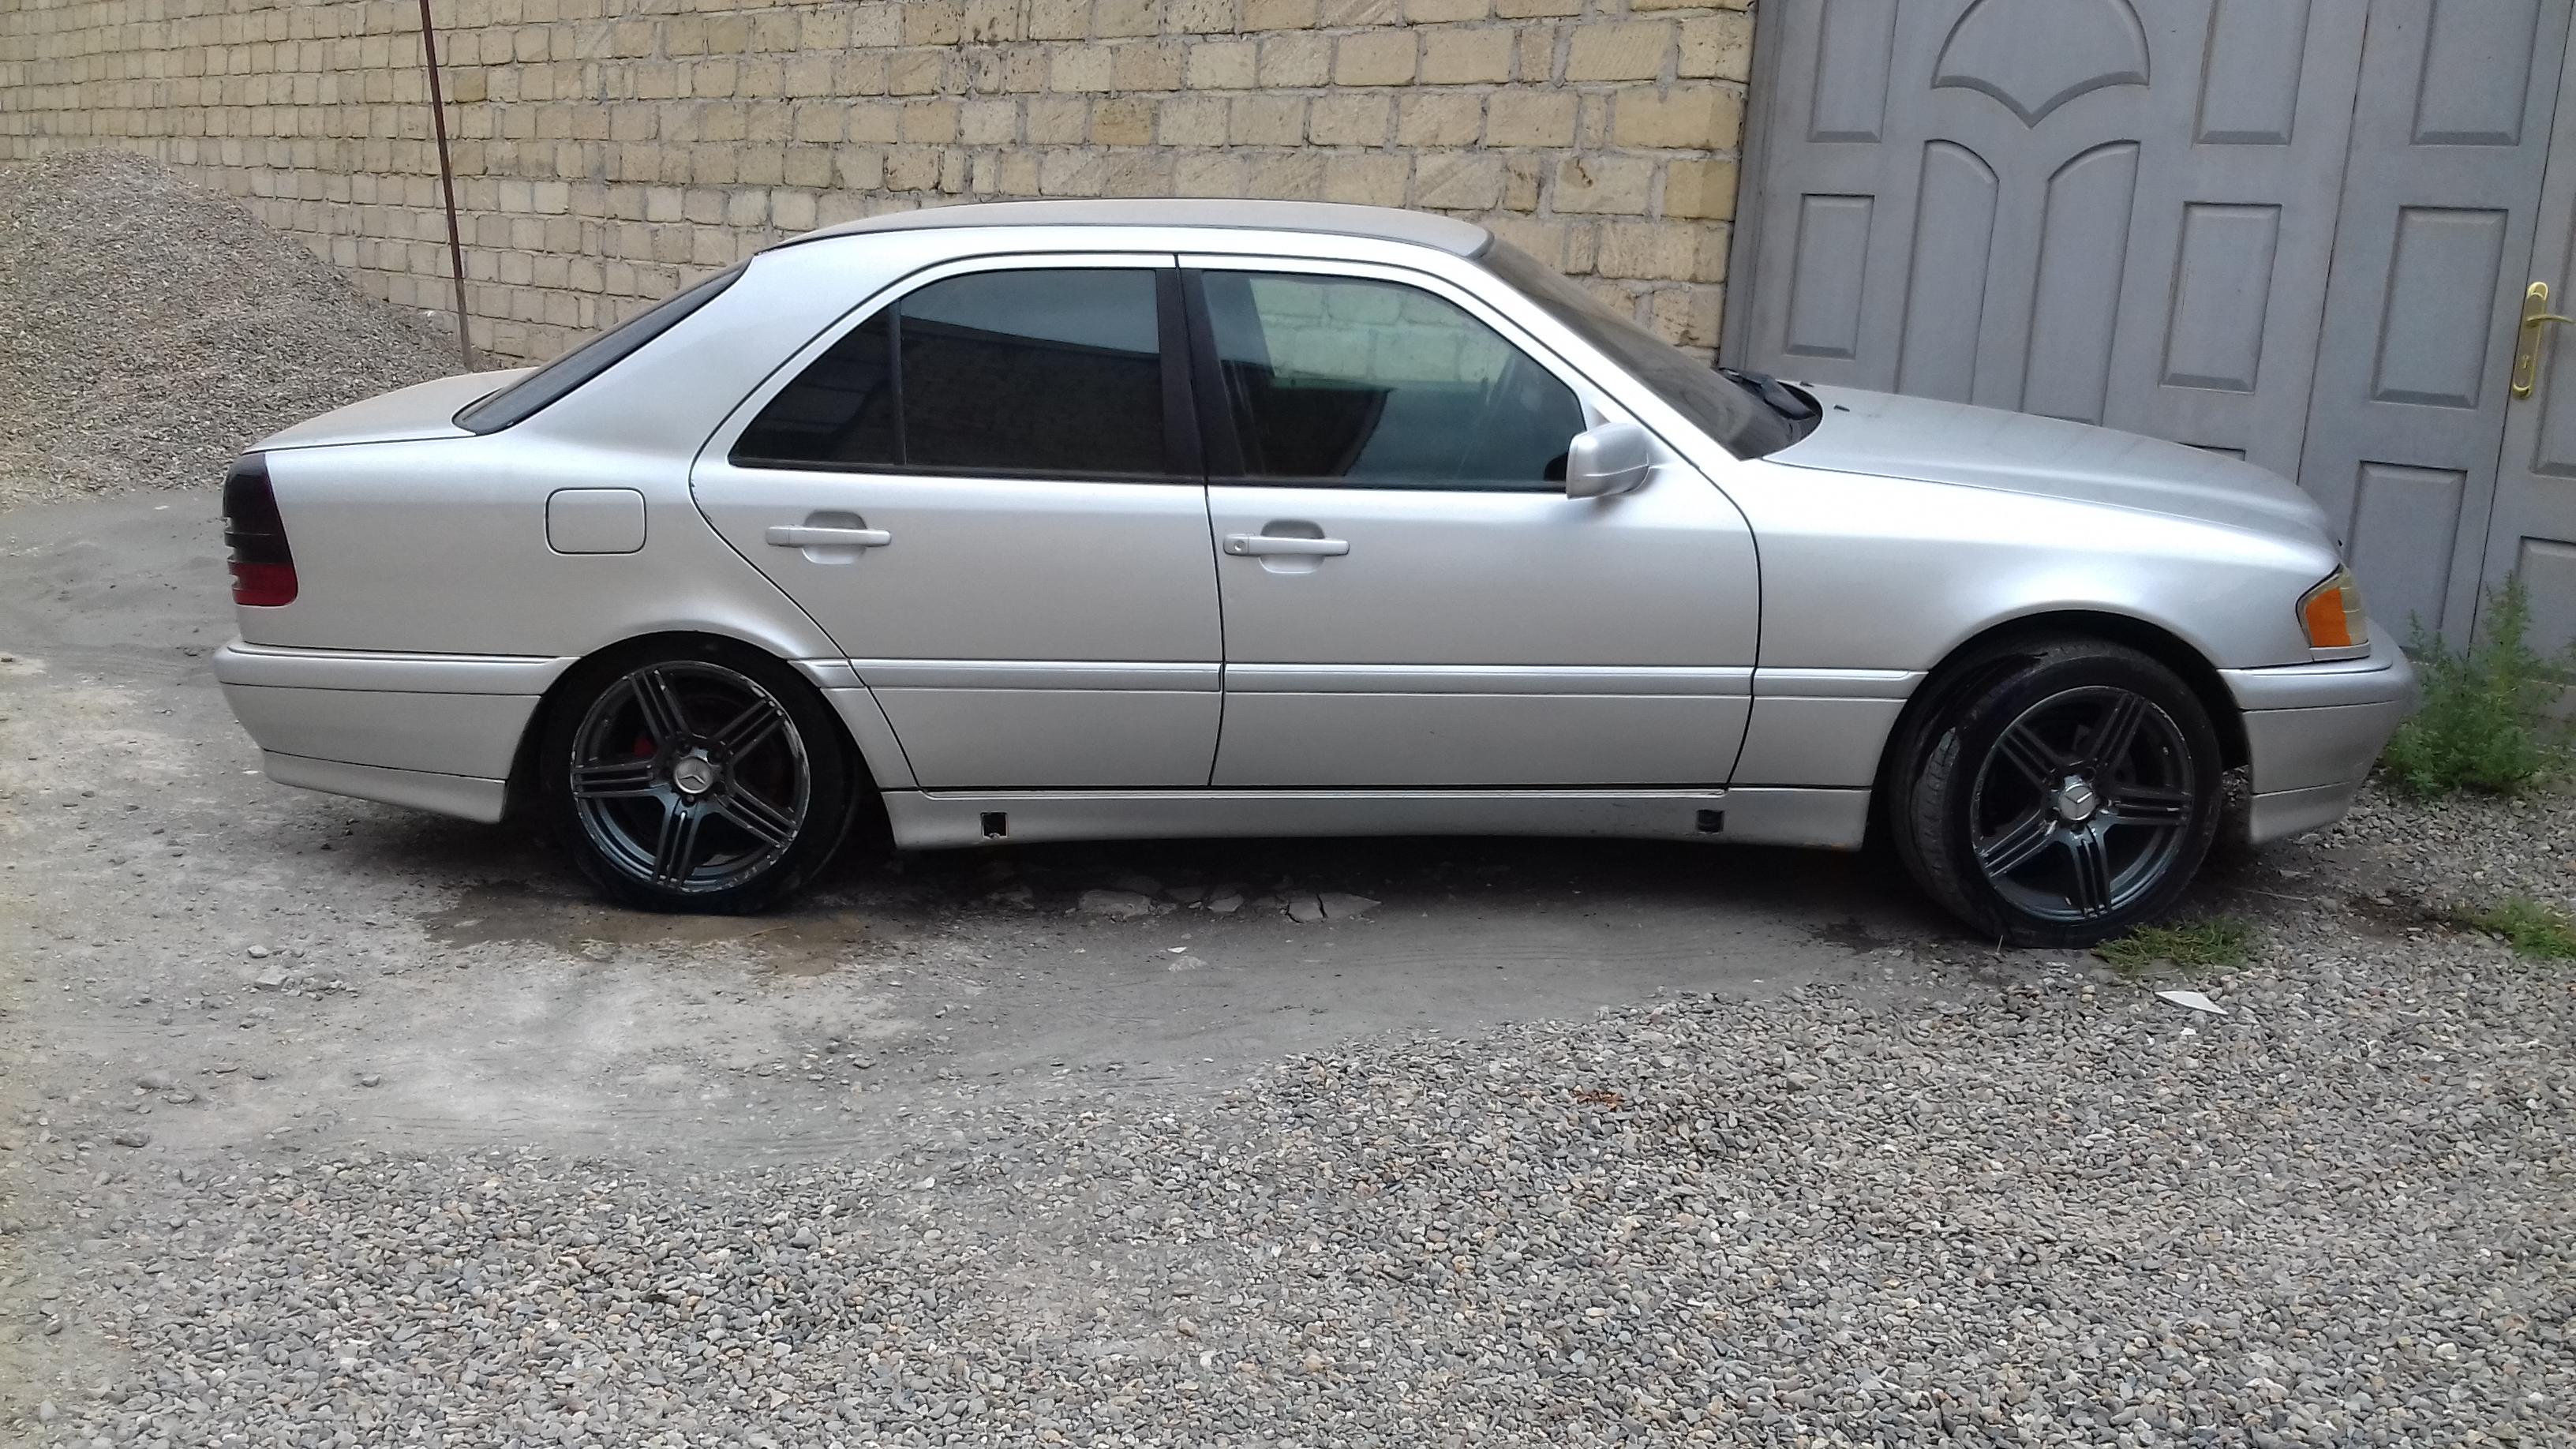 Mercedes-Benz C 180 1.8(lt) 1996 Second hand  $7200